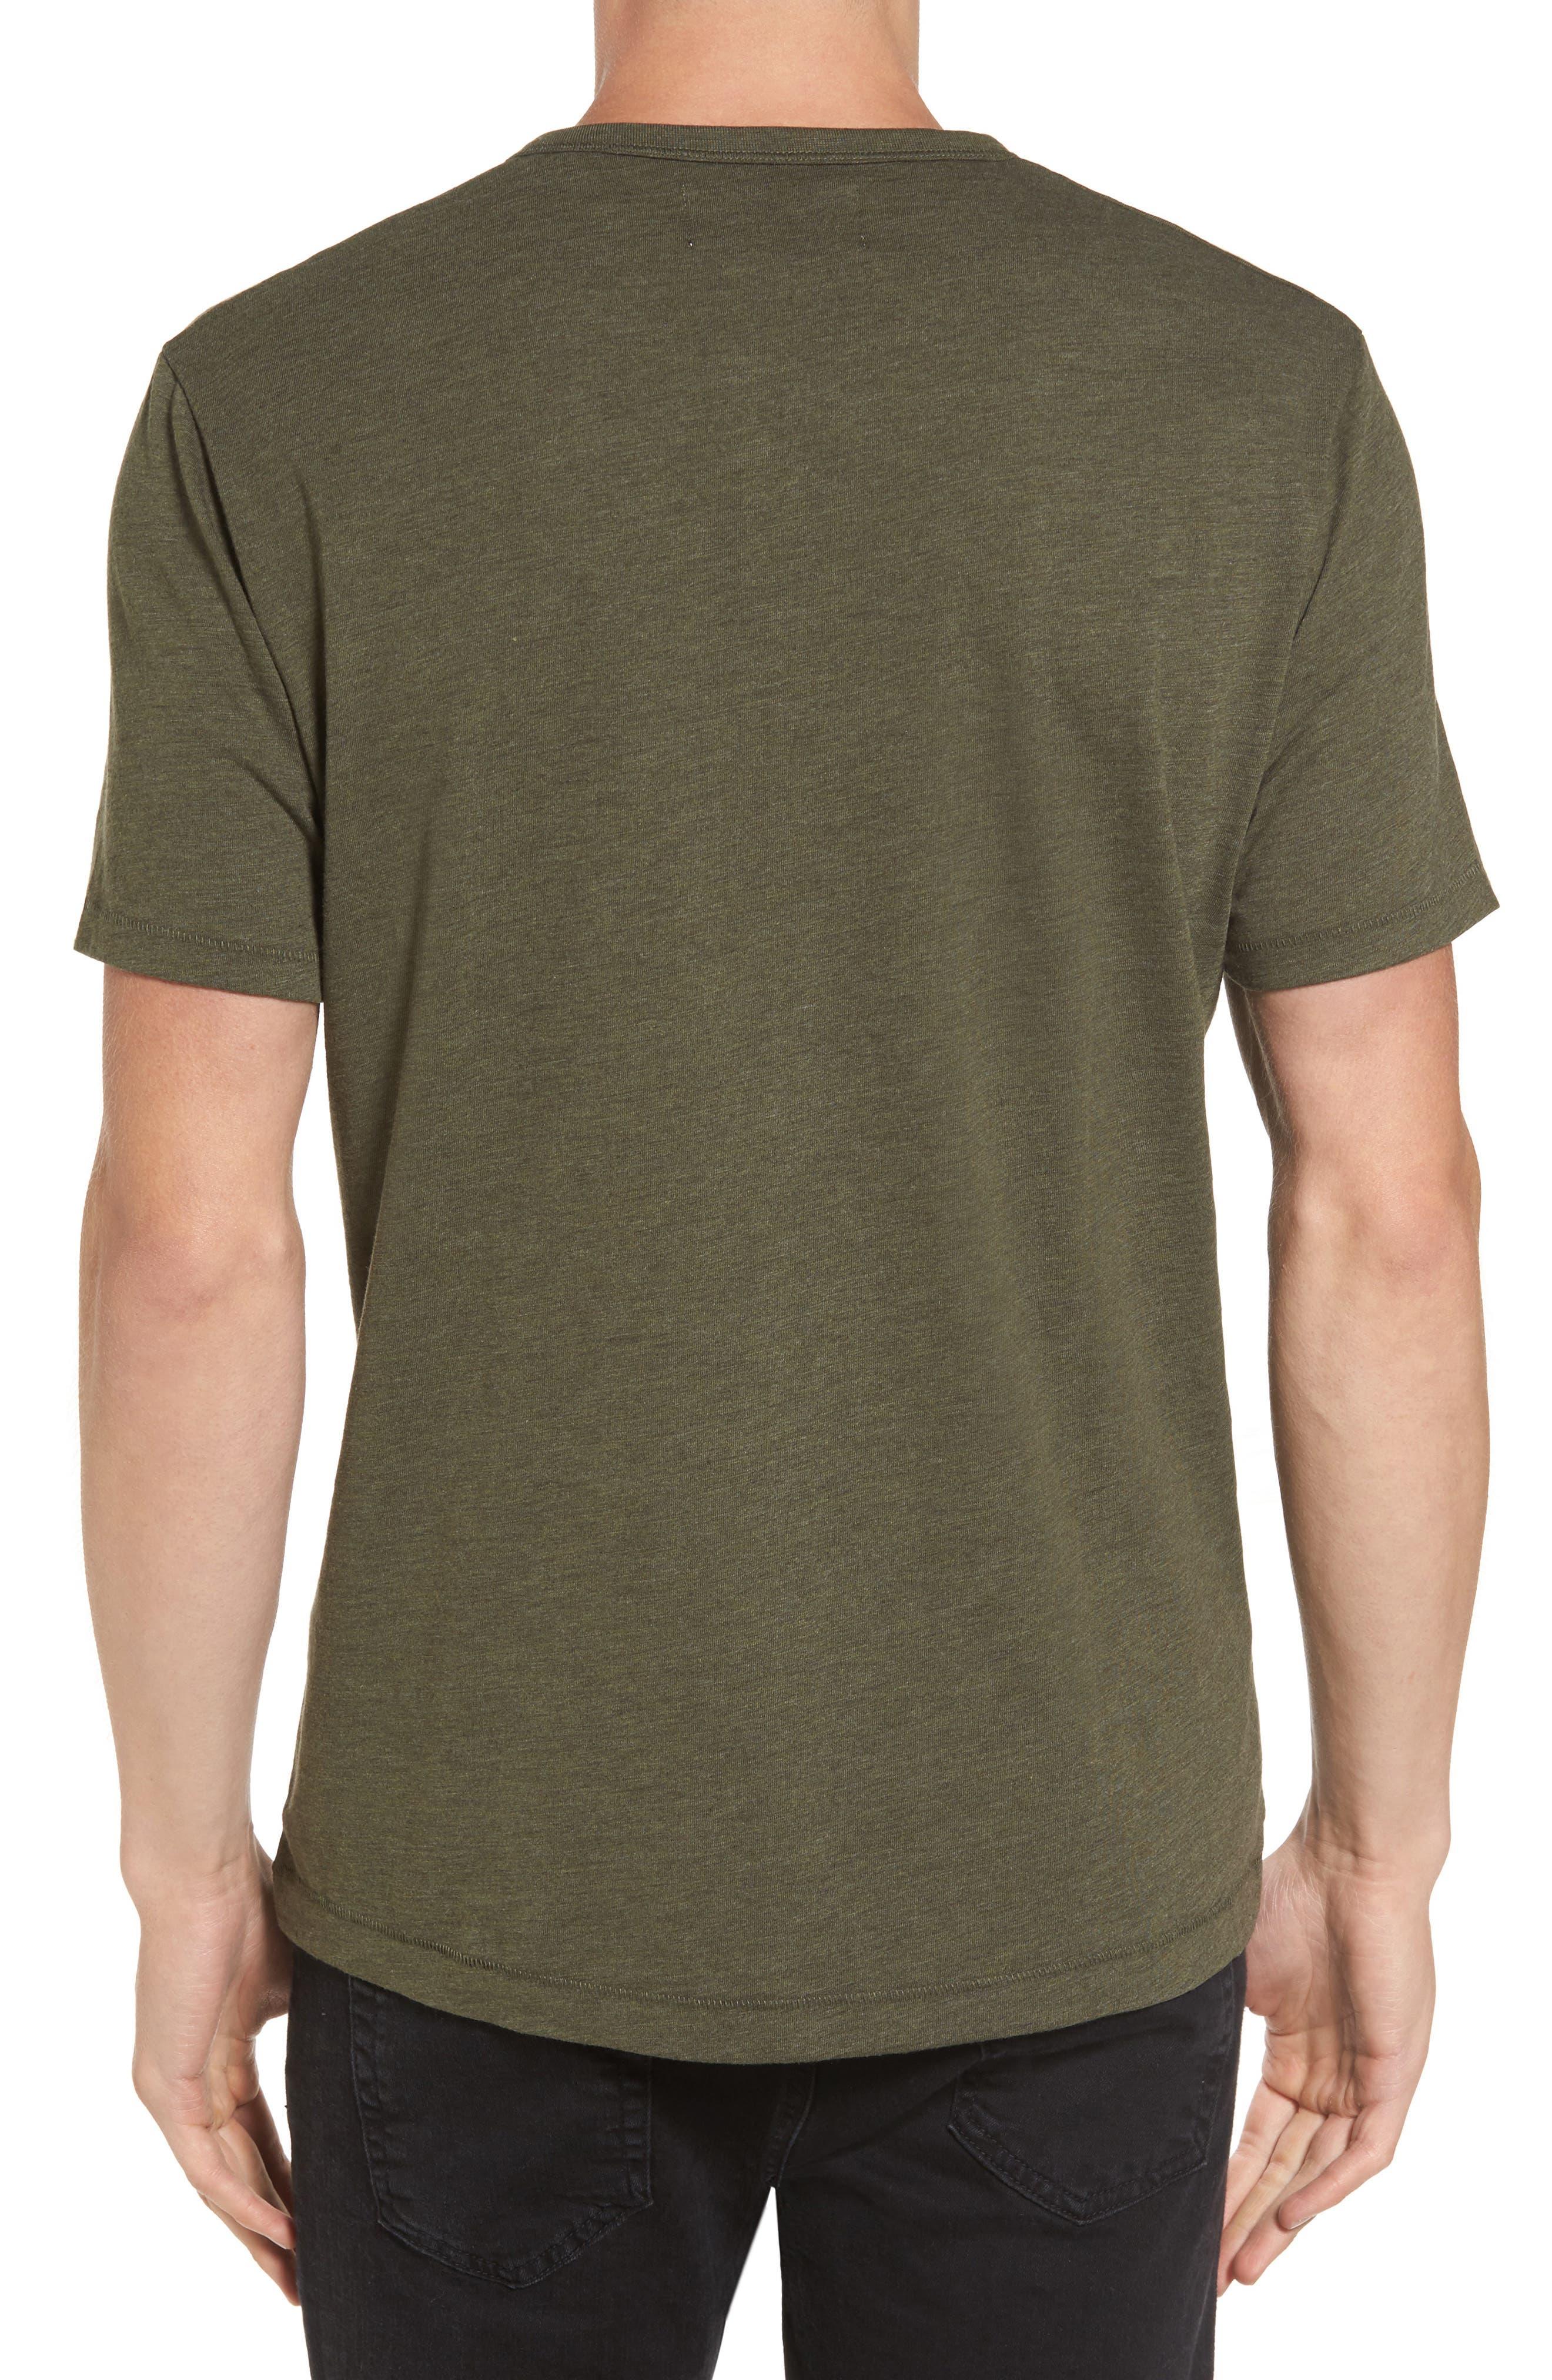 Alternate Image 2  - Original Penguin Bing Short Sleeve Henley Shirt